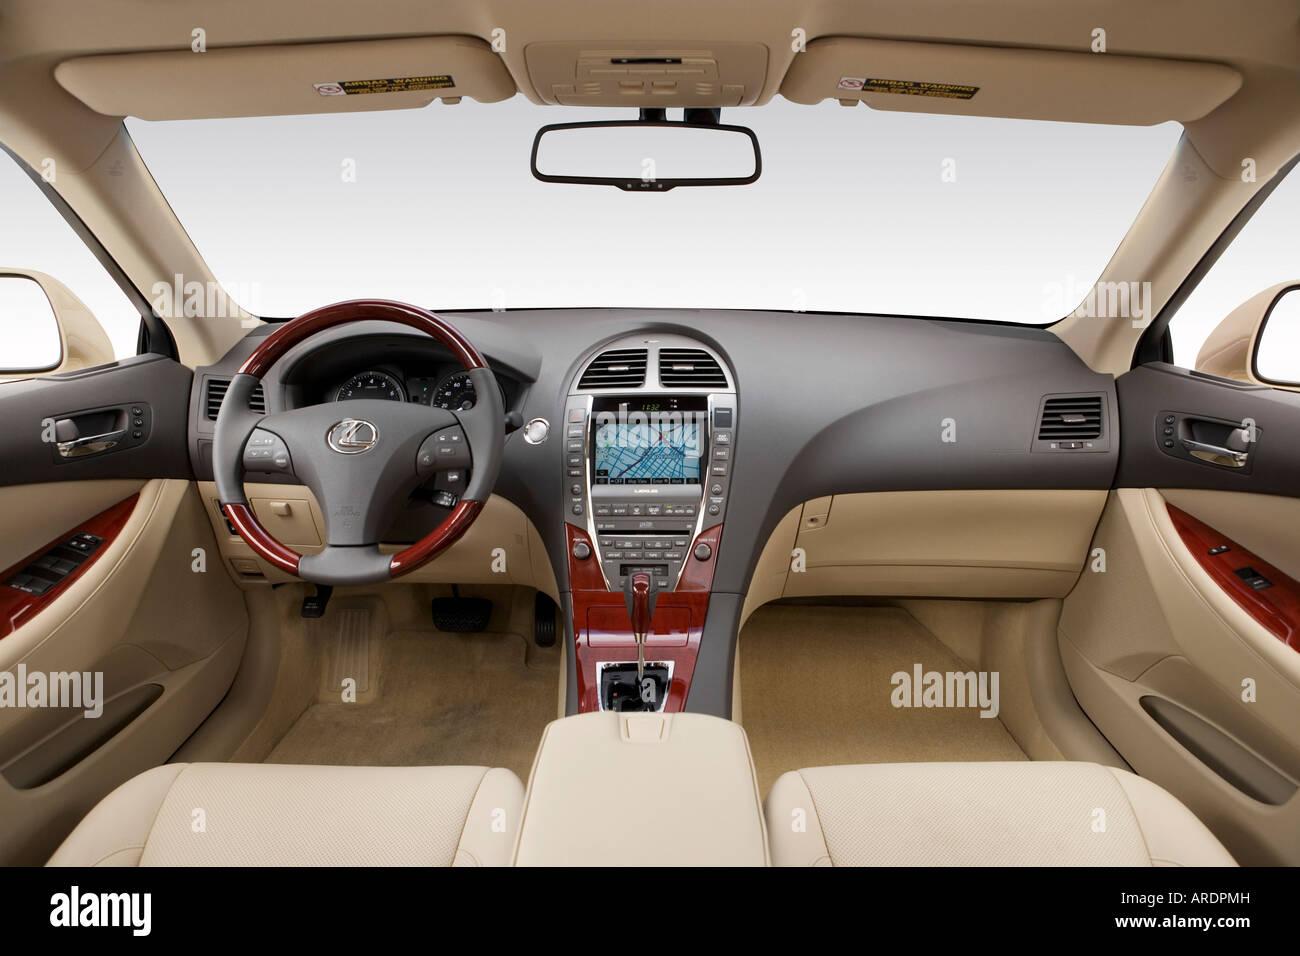 2007 Lexus ES 350 Em Ouro   Painel De Bordo, Consola Central, Vista De  Mudança De Marchas